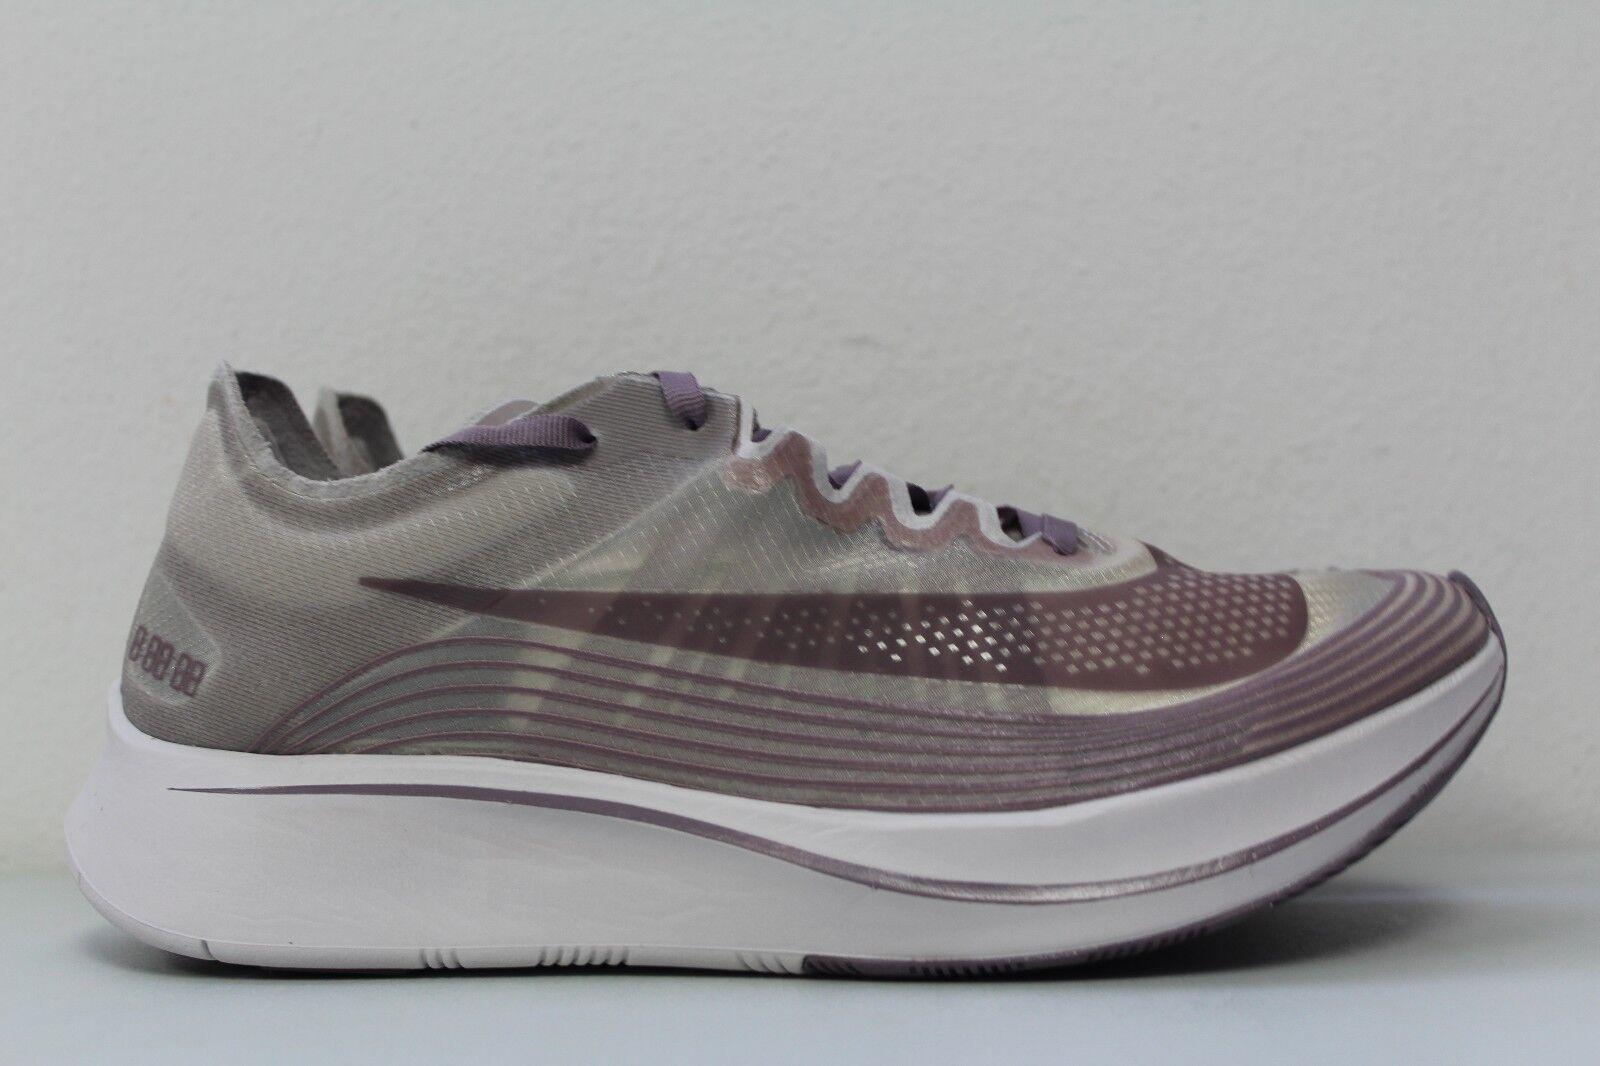 Nike Uomo nikelab zoom fly sp dimensioni grigio grigio ossidiana aa3172 200